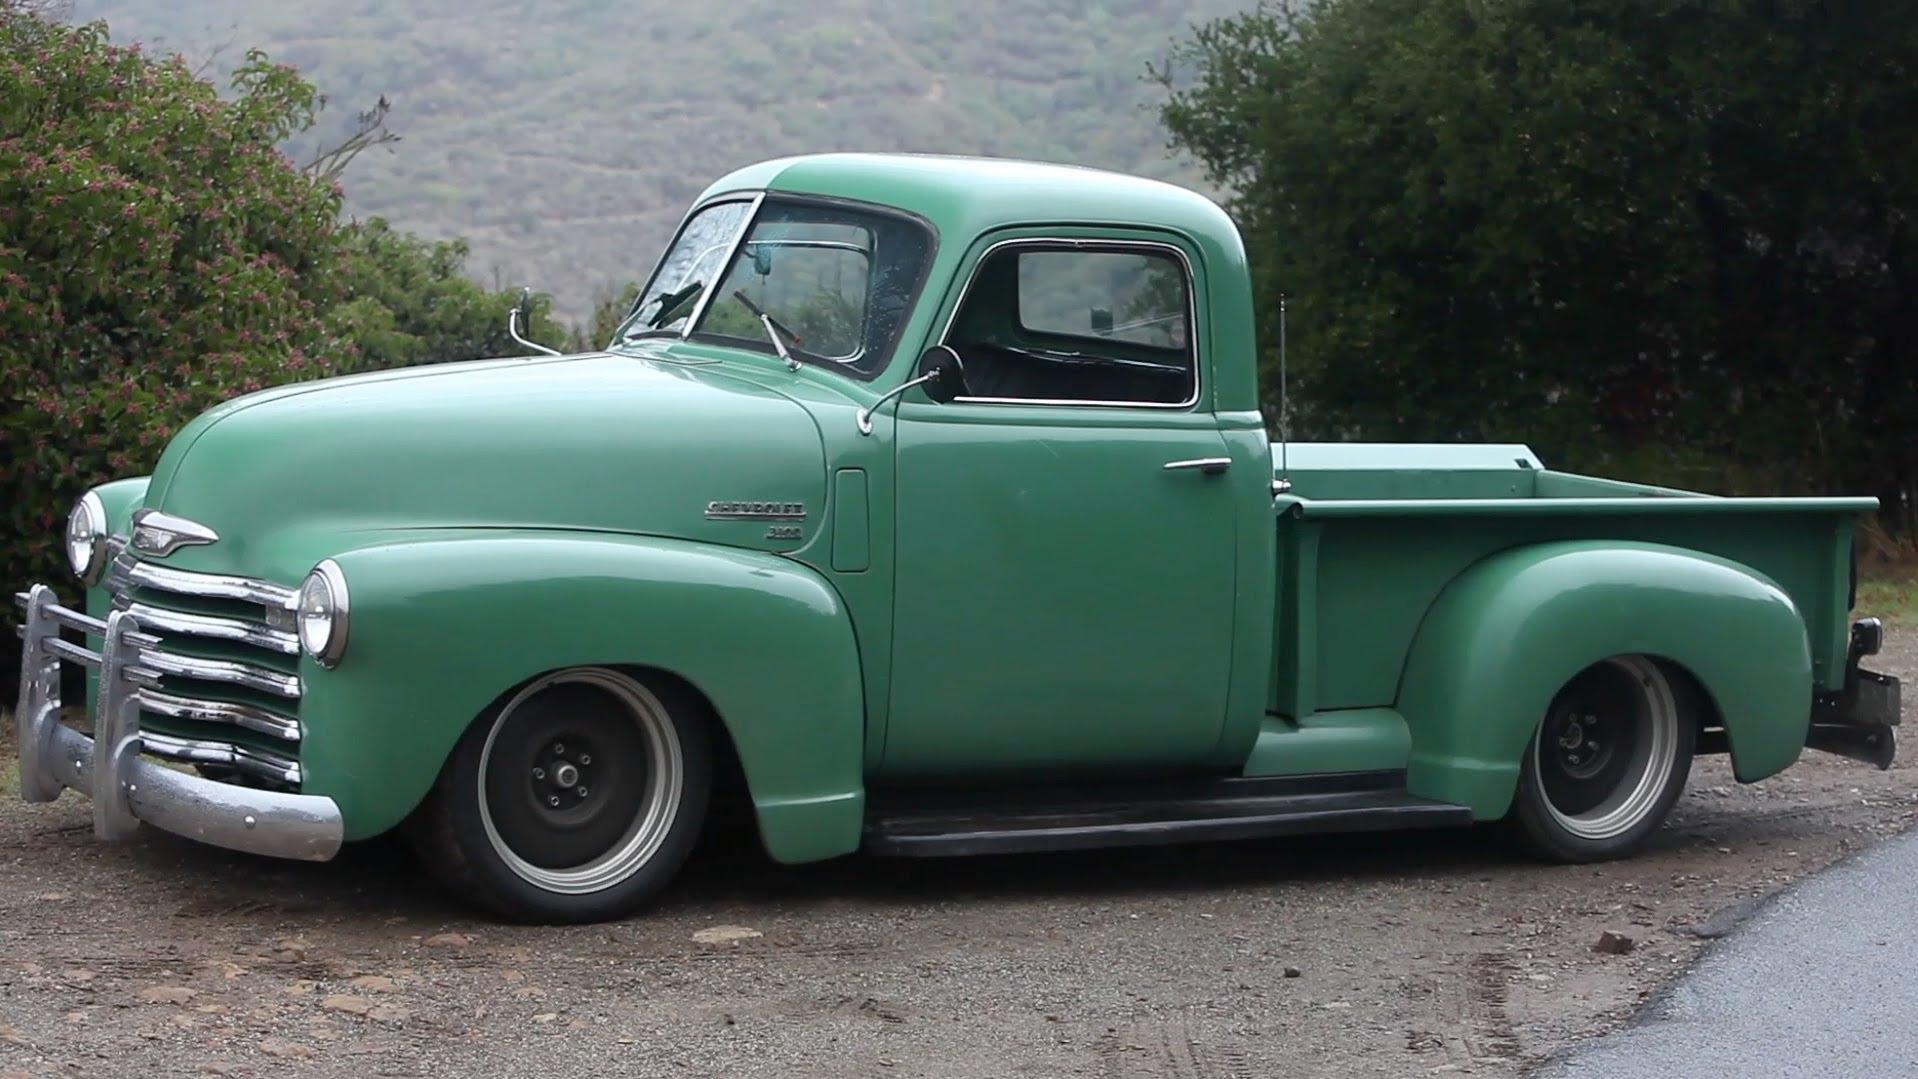 Car Ancestry1950 Chevrolet Morrison Farm Truck